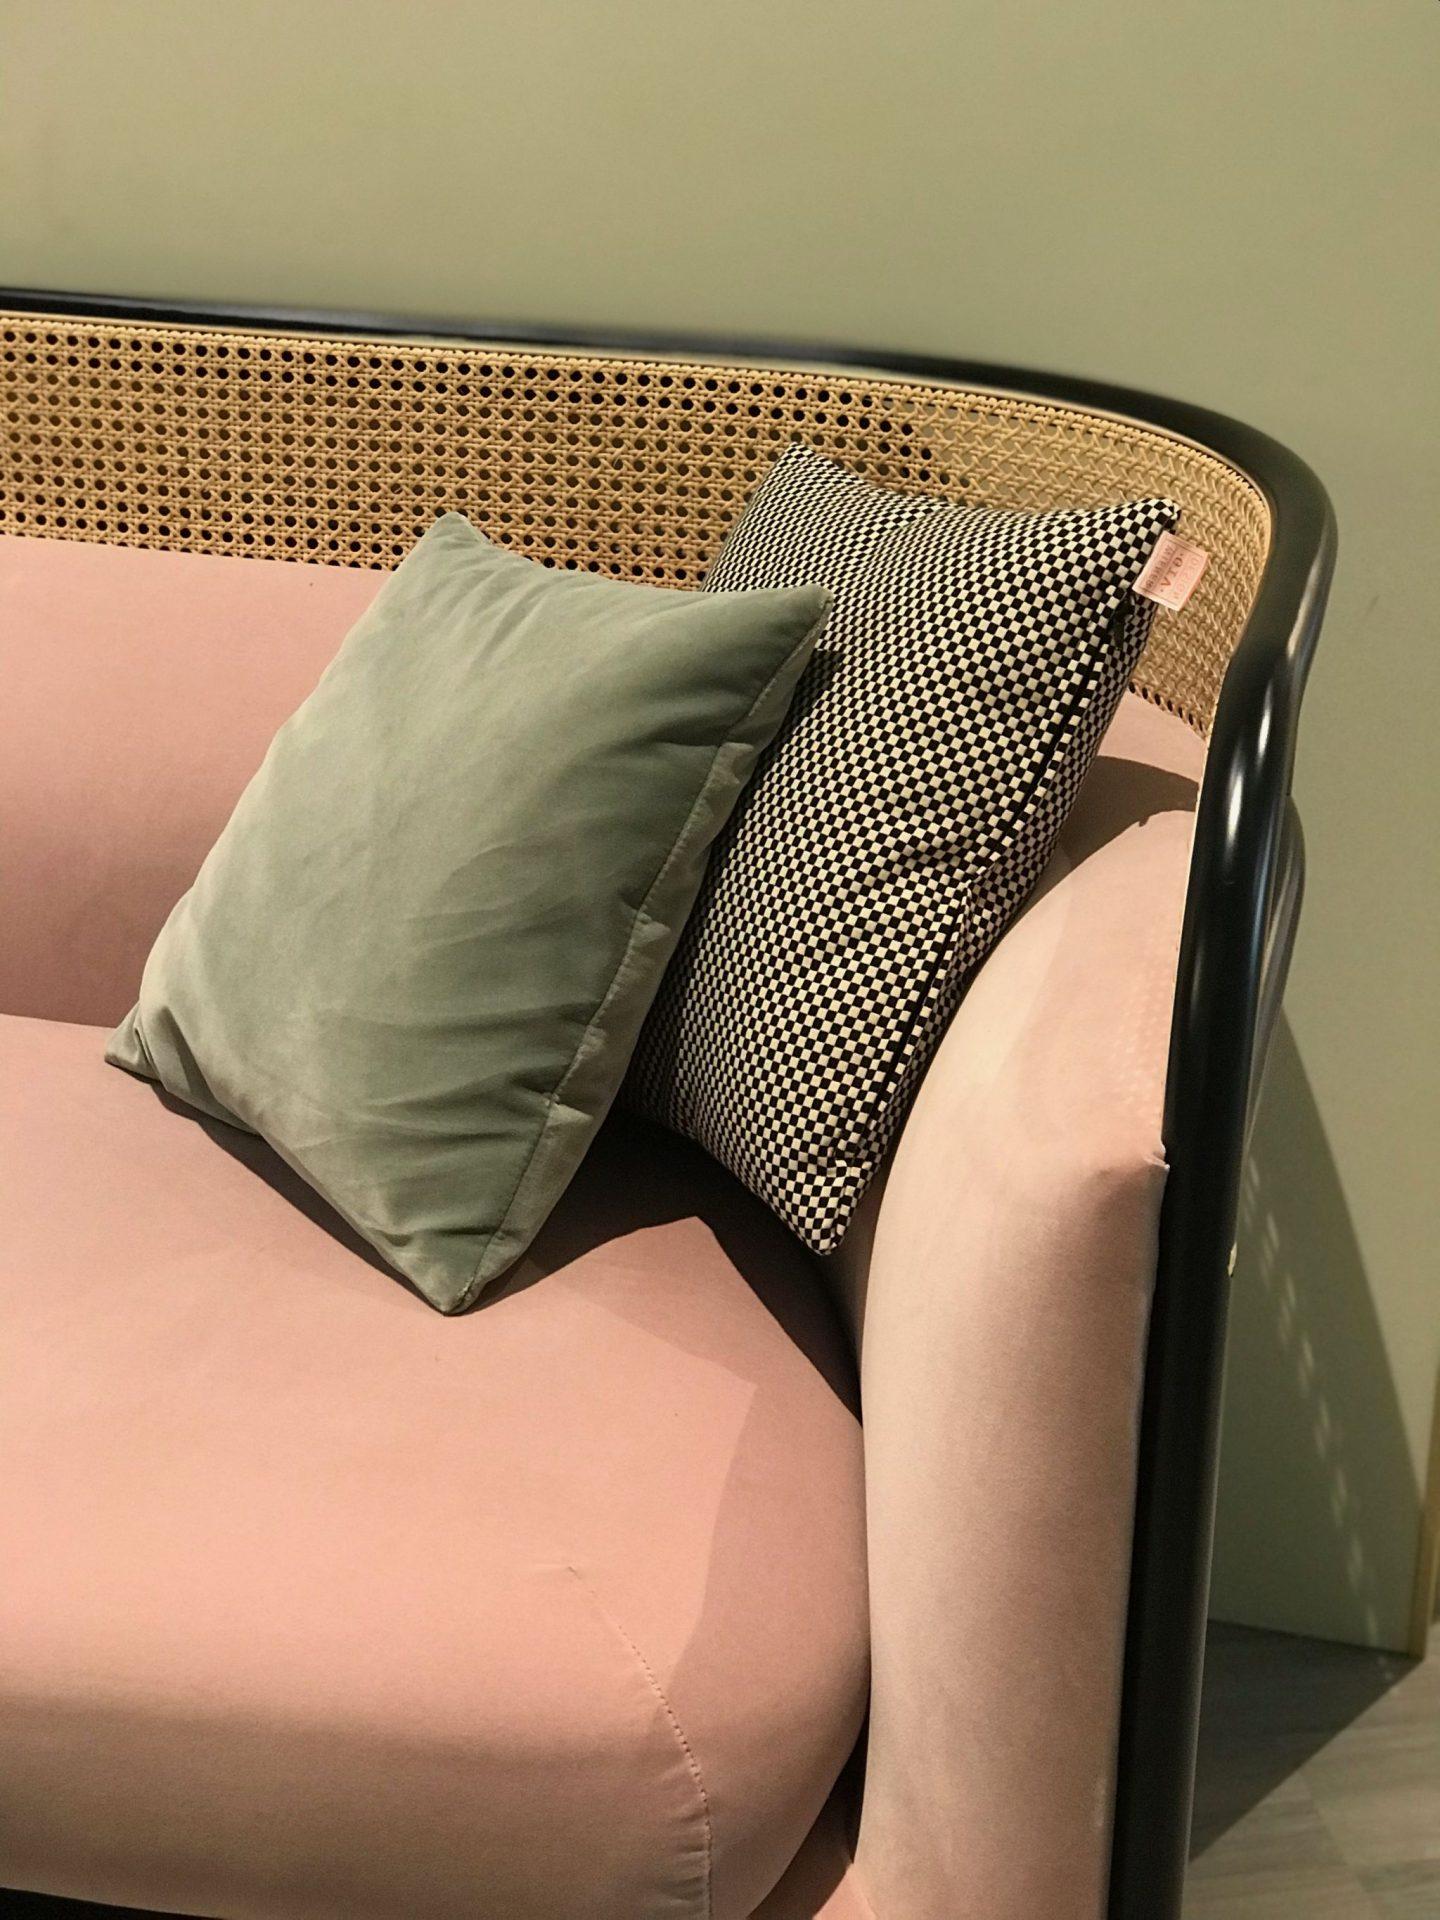 Maison & Objet, MO18, hellopeagreen, interior design, new design, trade show report